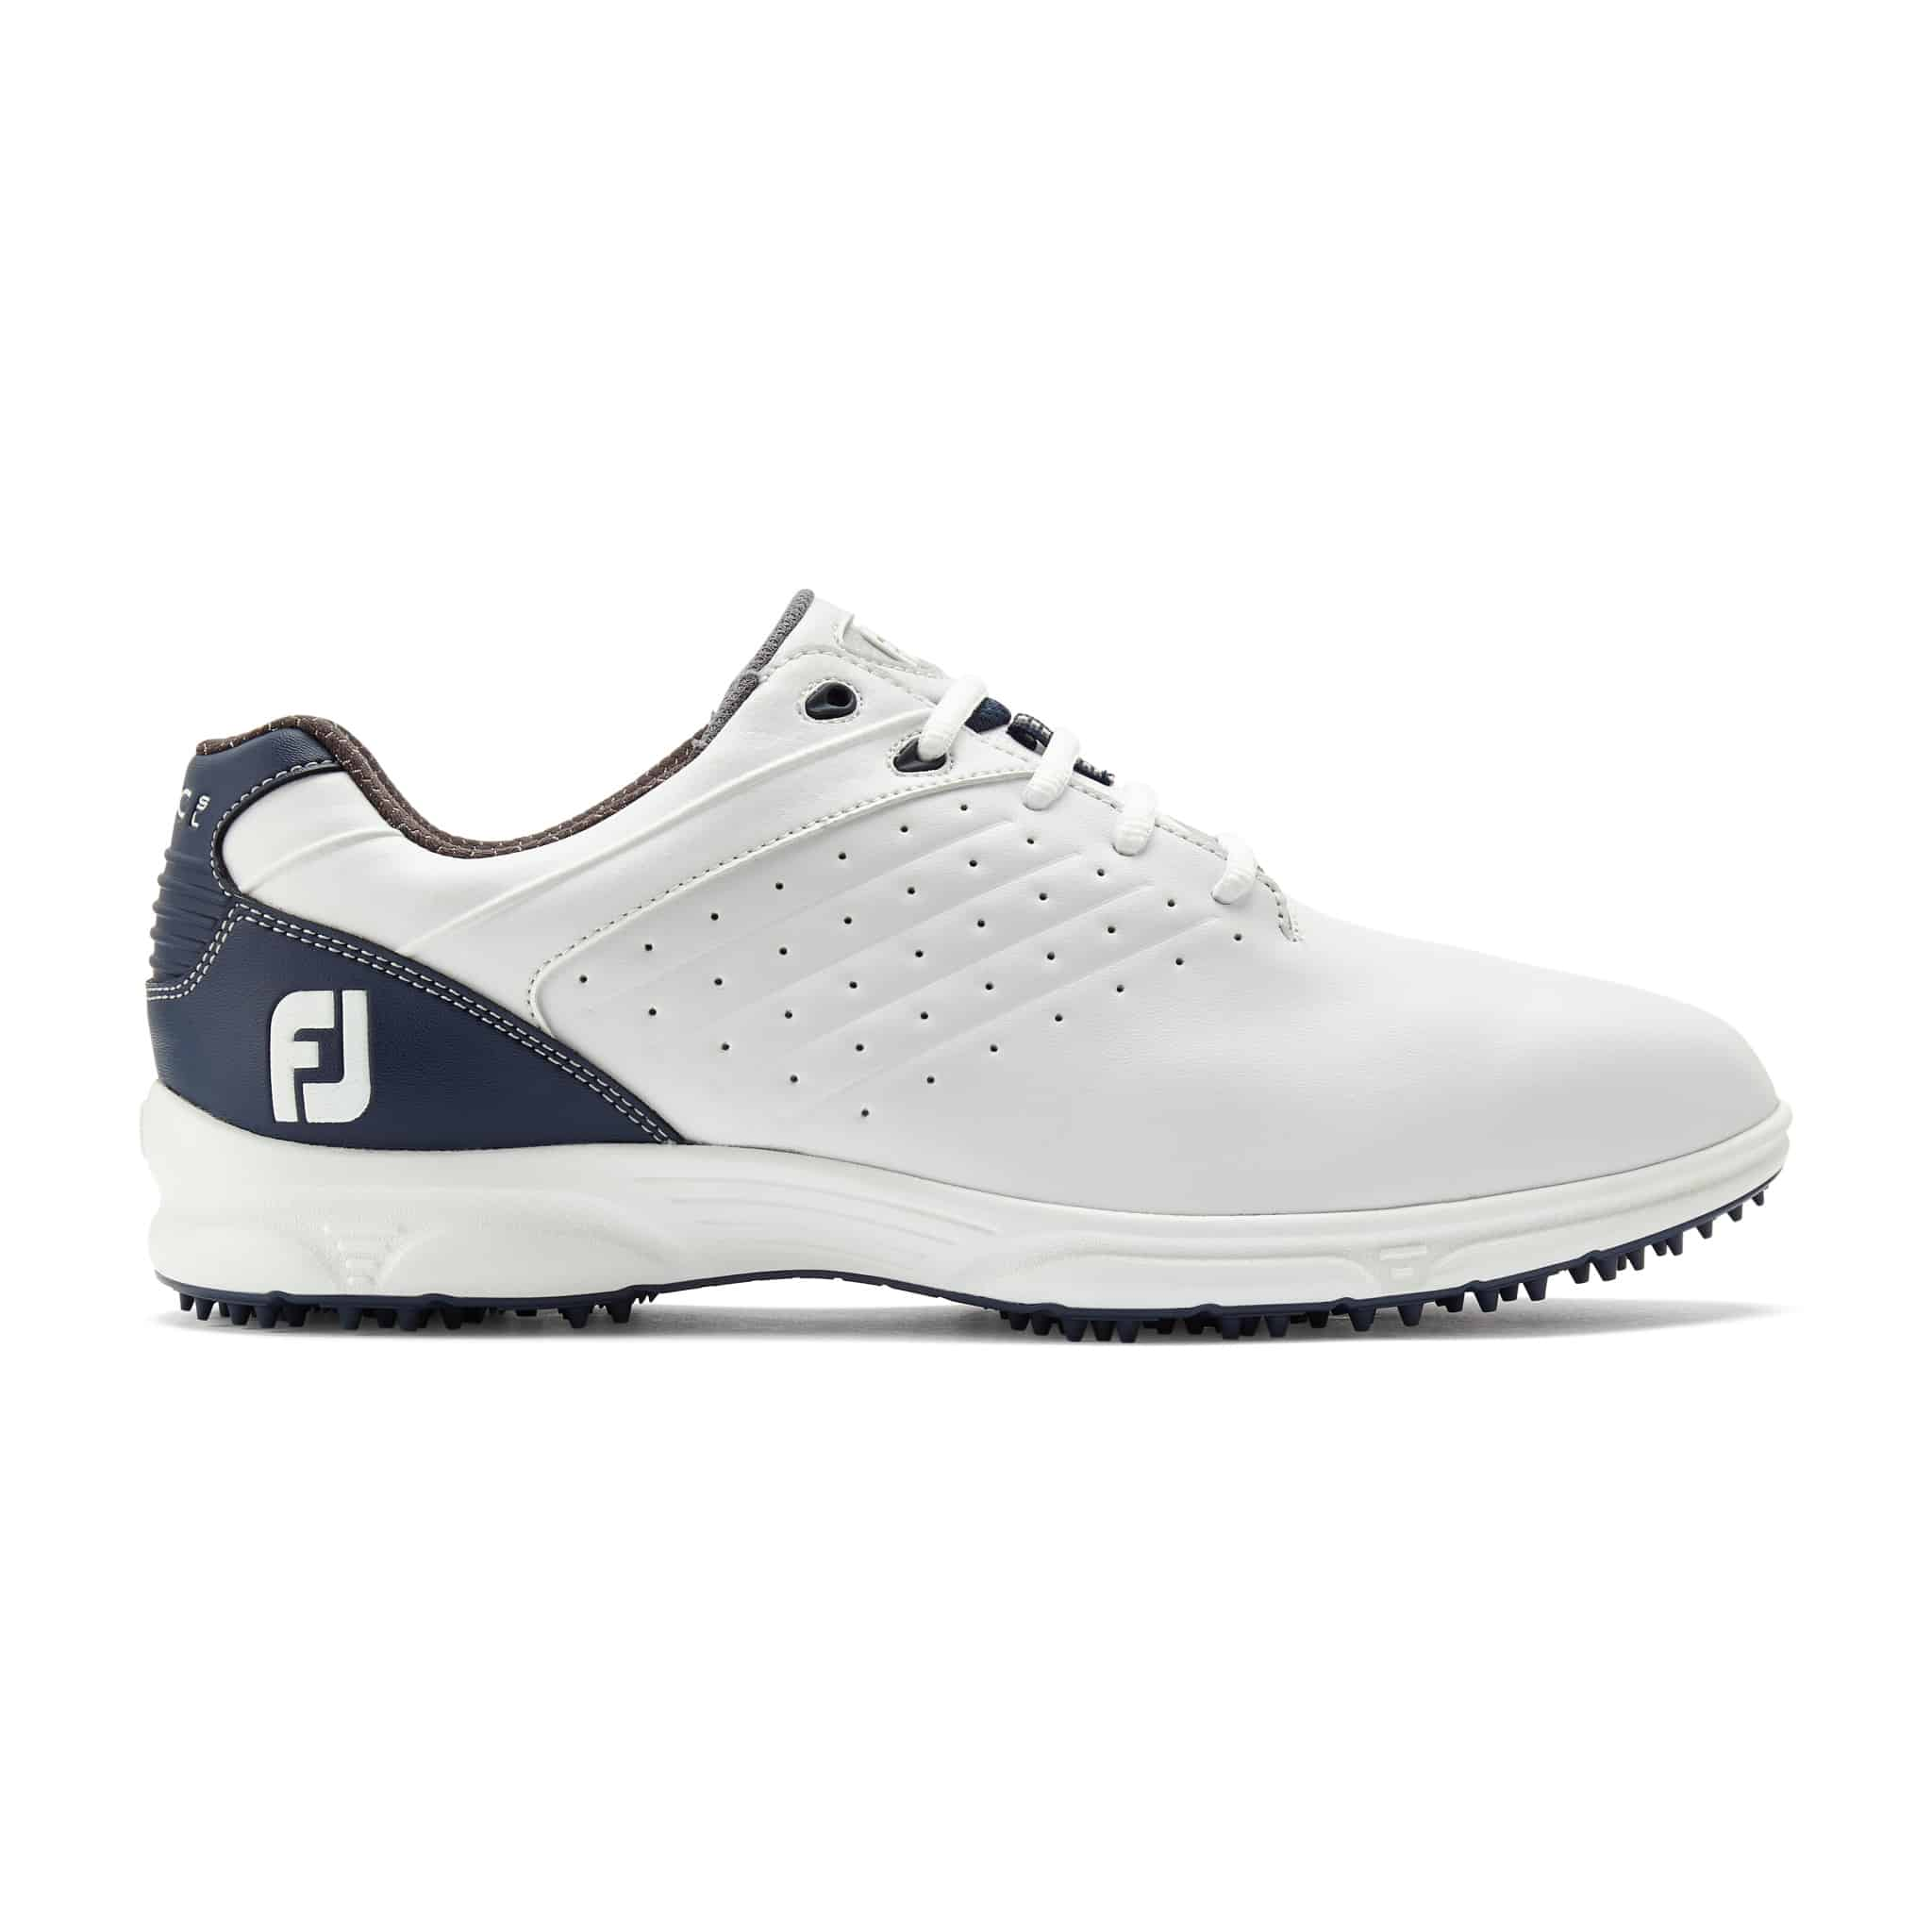 Macgregor Golf Shoes Spikeless